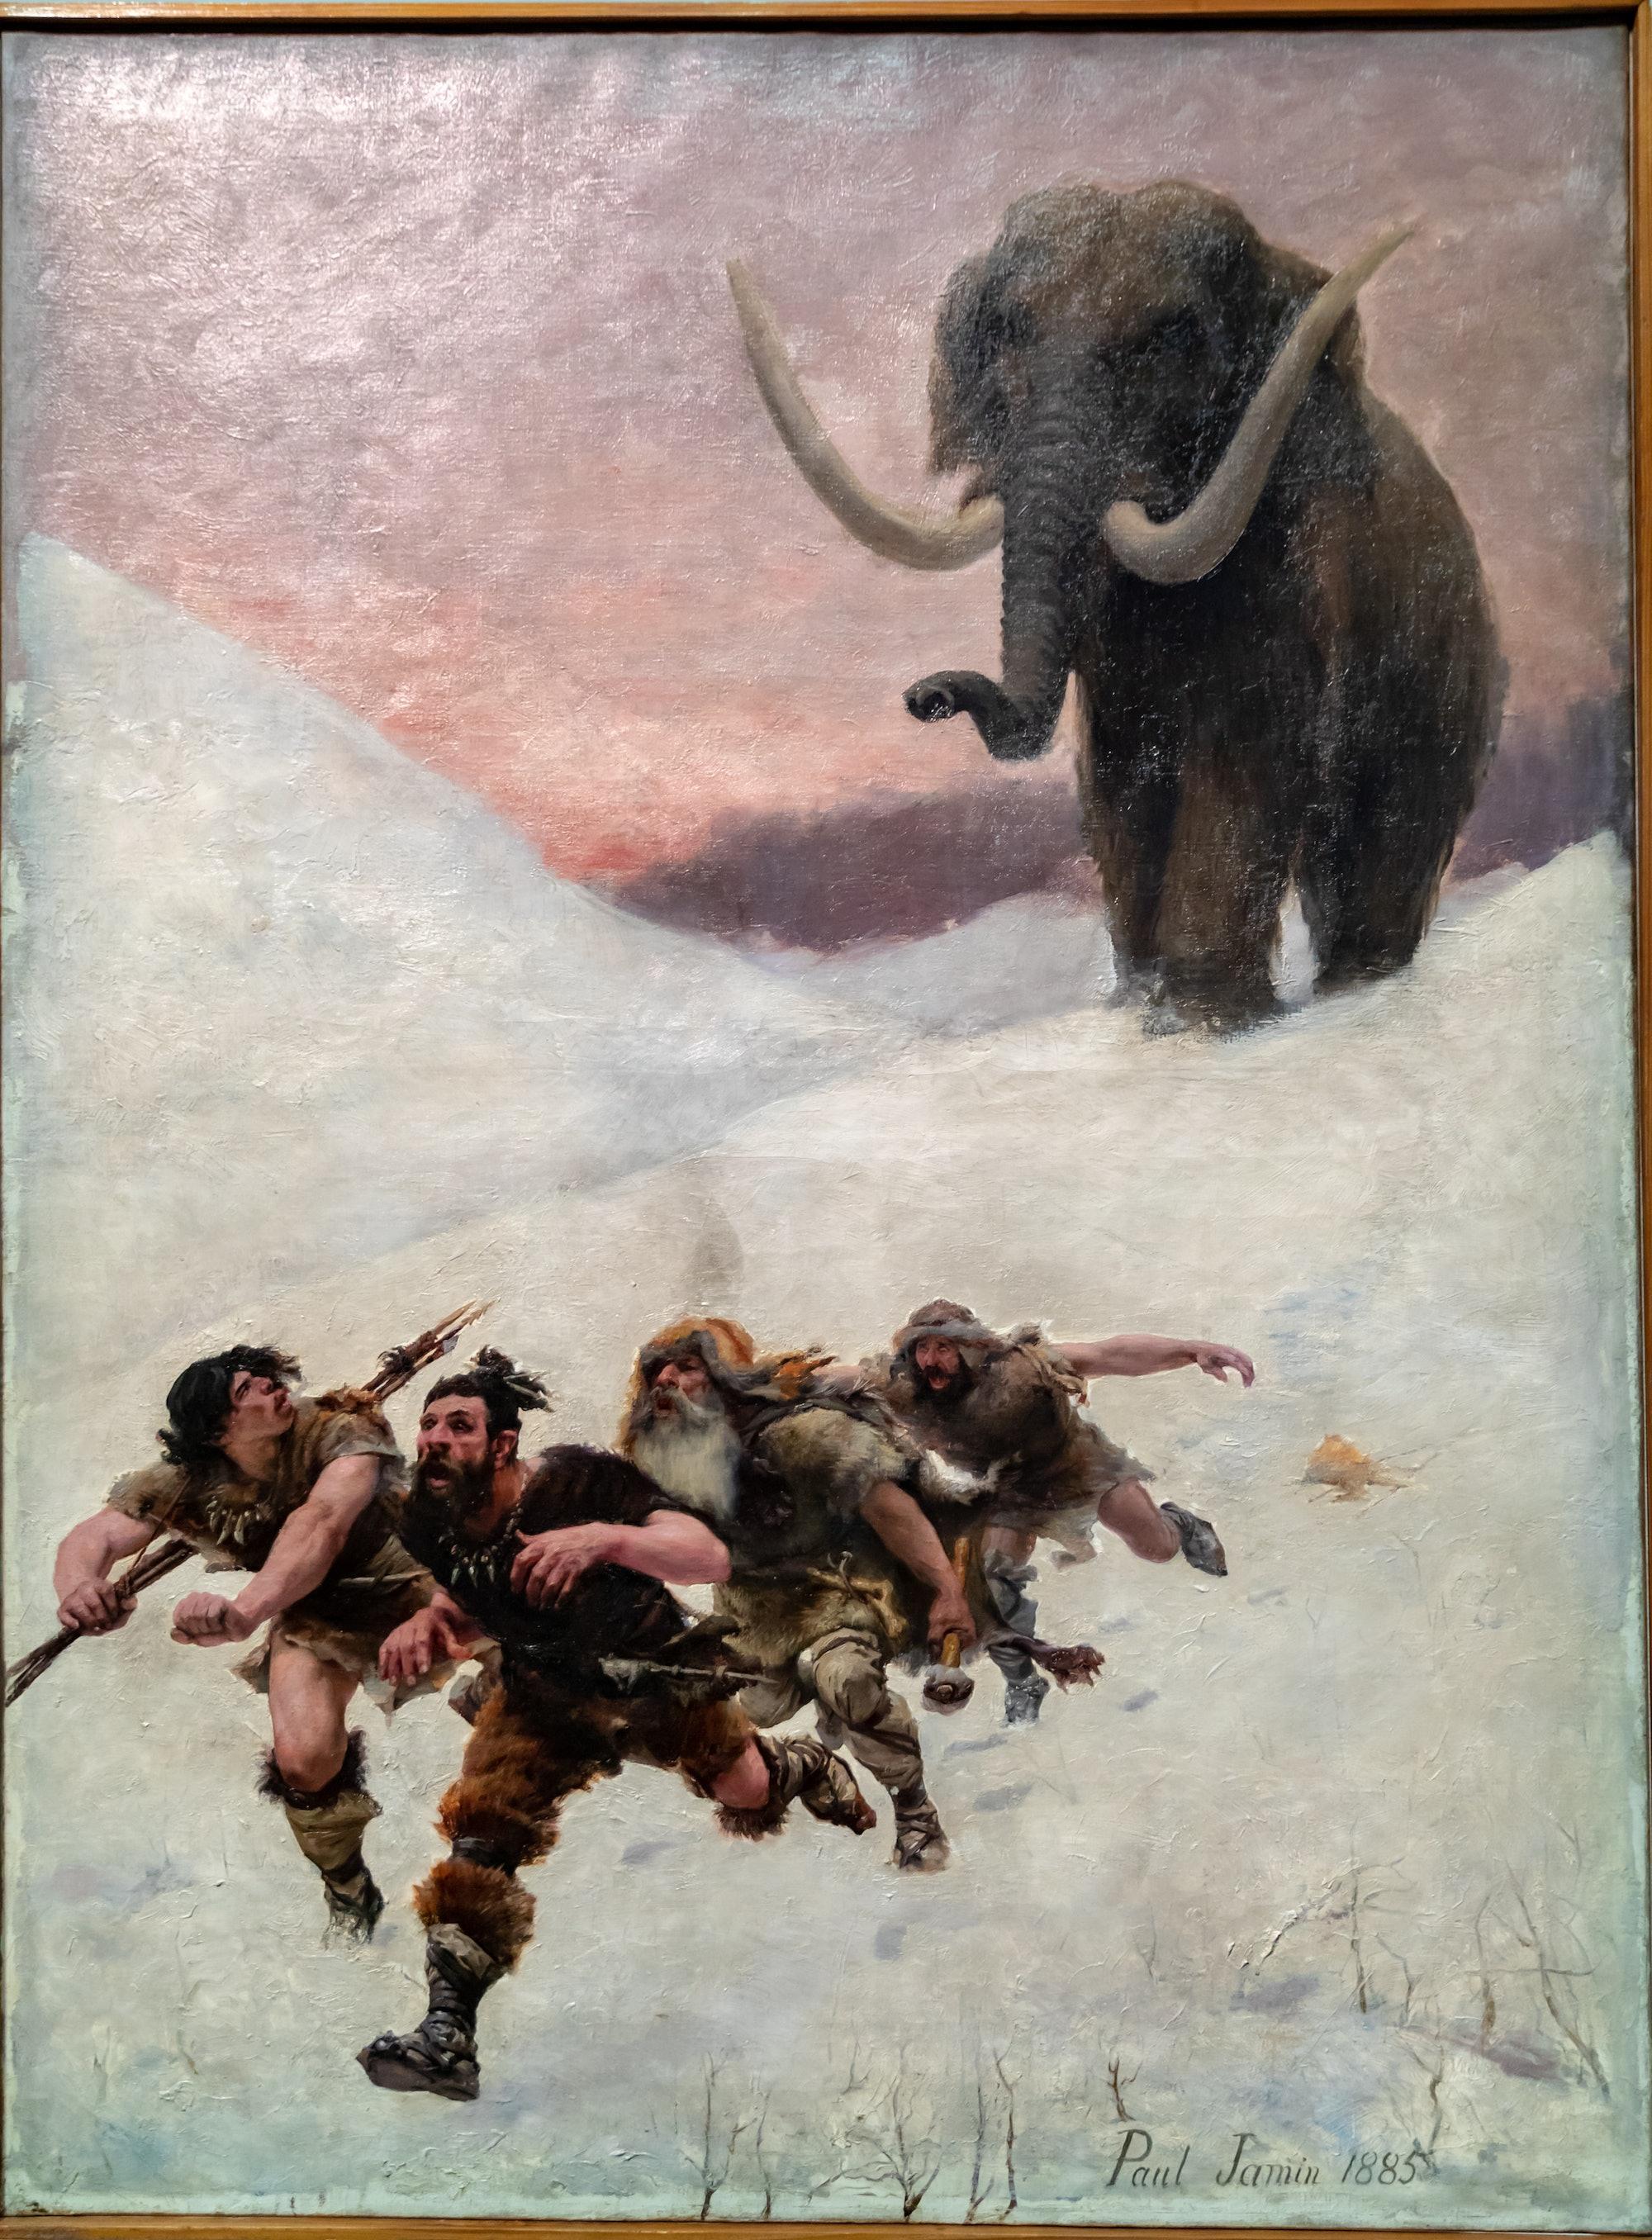 Neanderthal Exhibition, Paris